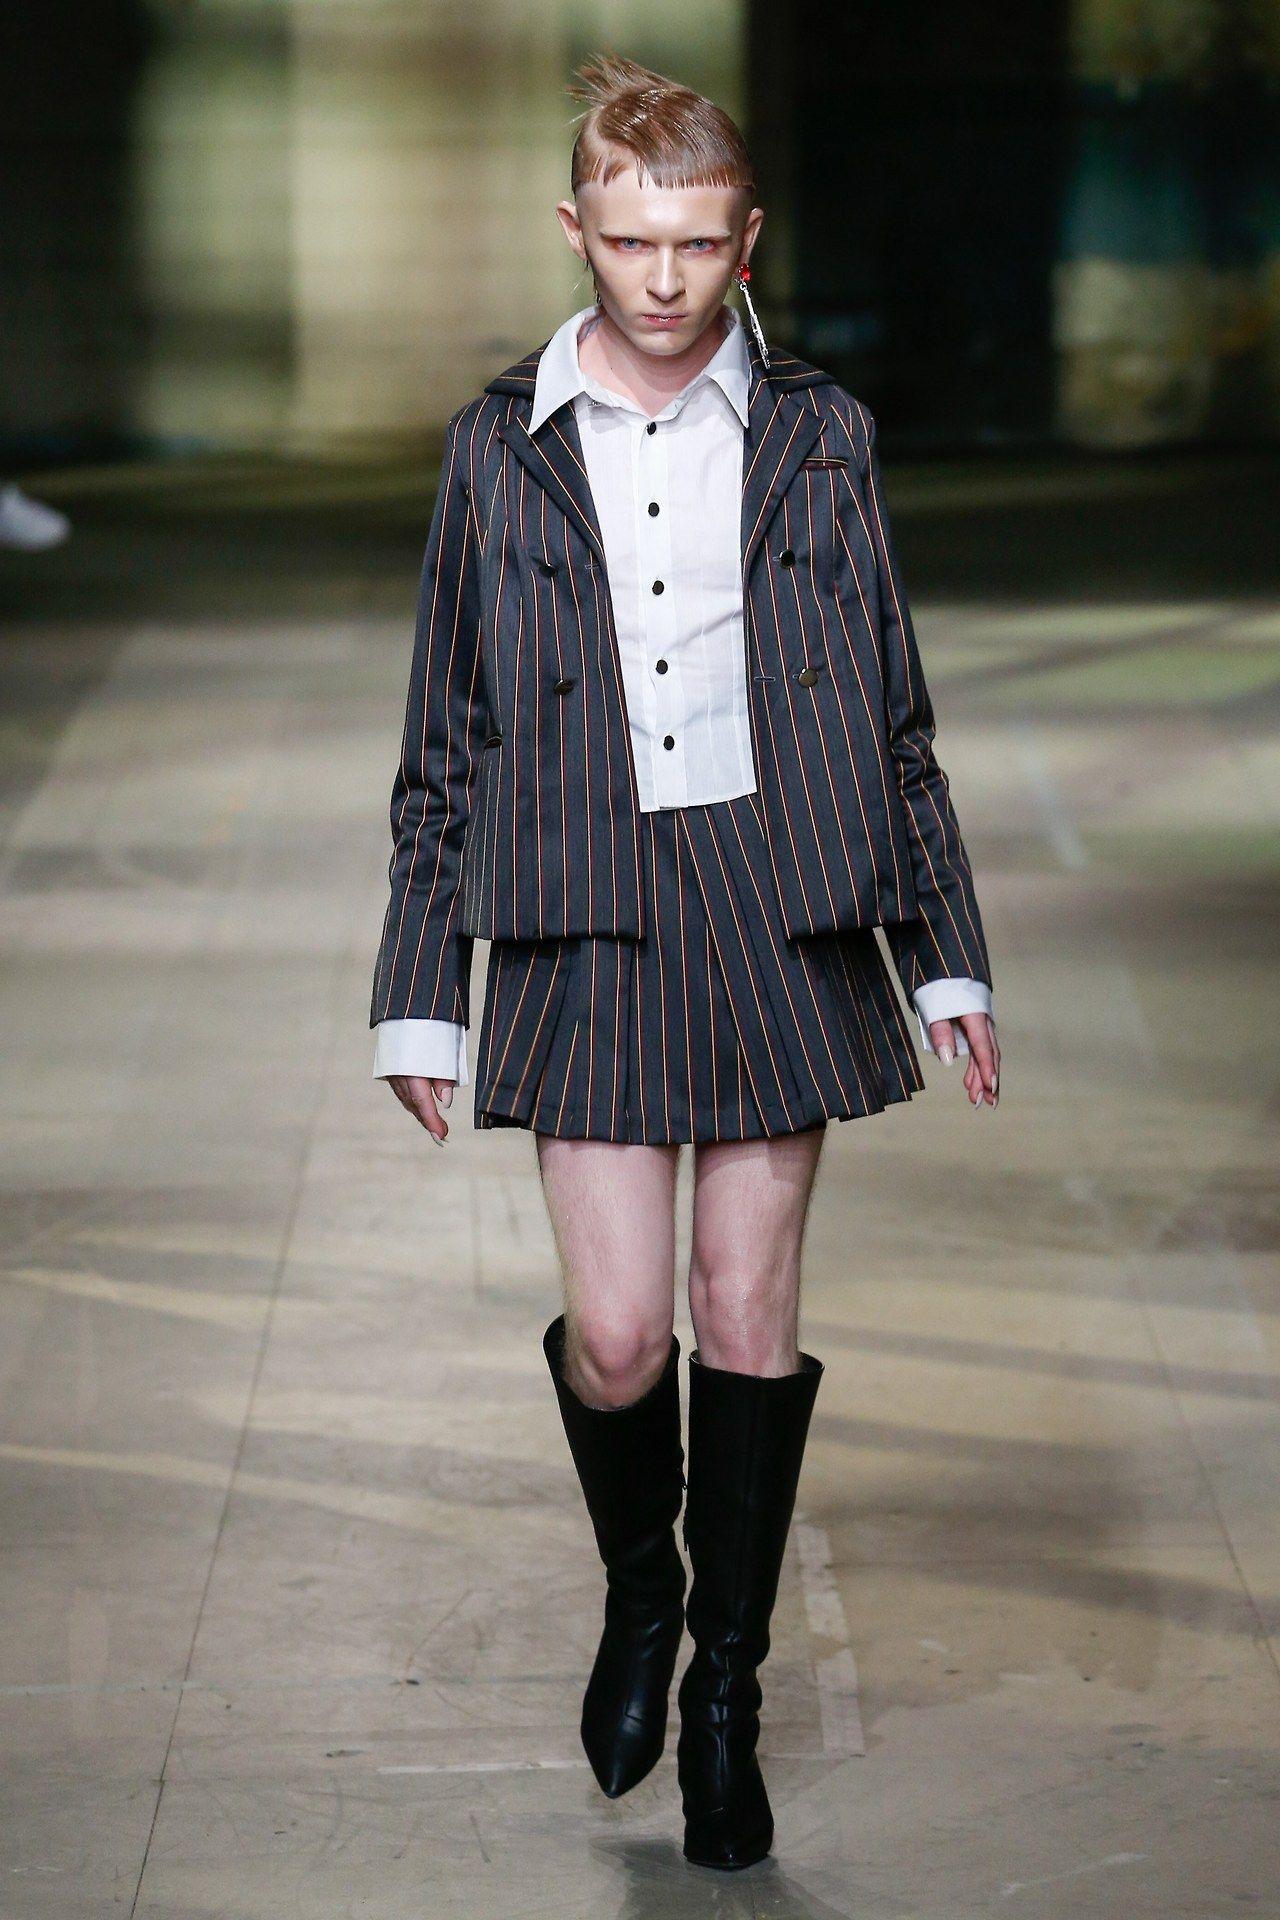 Fall 2017 Ready-to-Wear Fashion shows - Vogue Vogue fashion school london